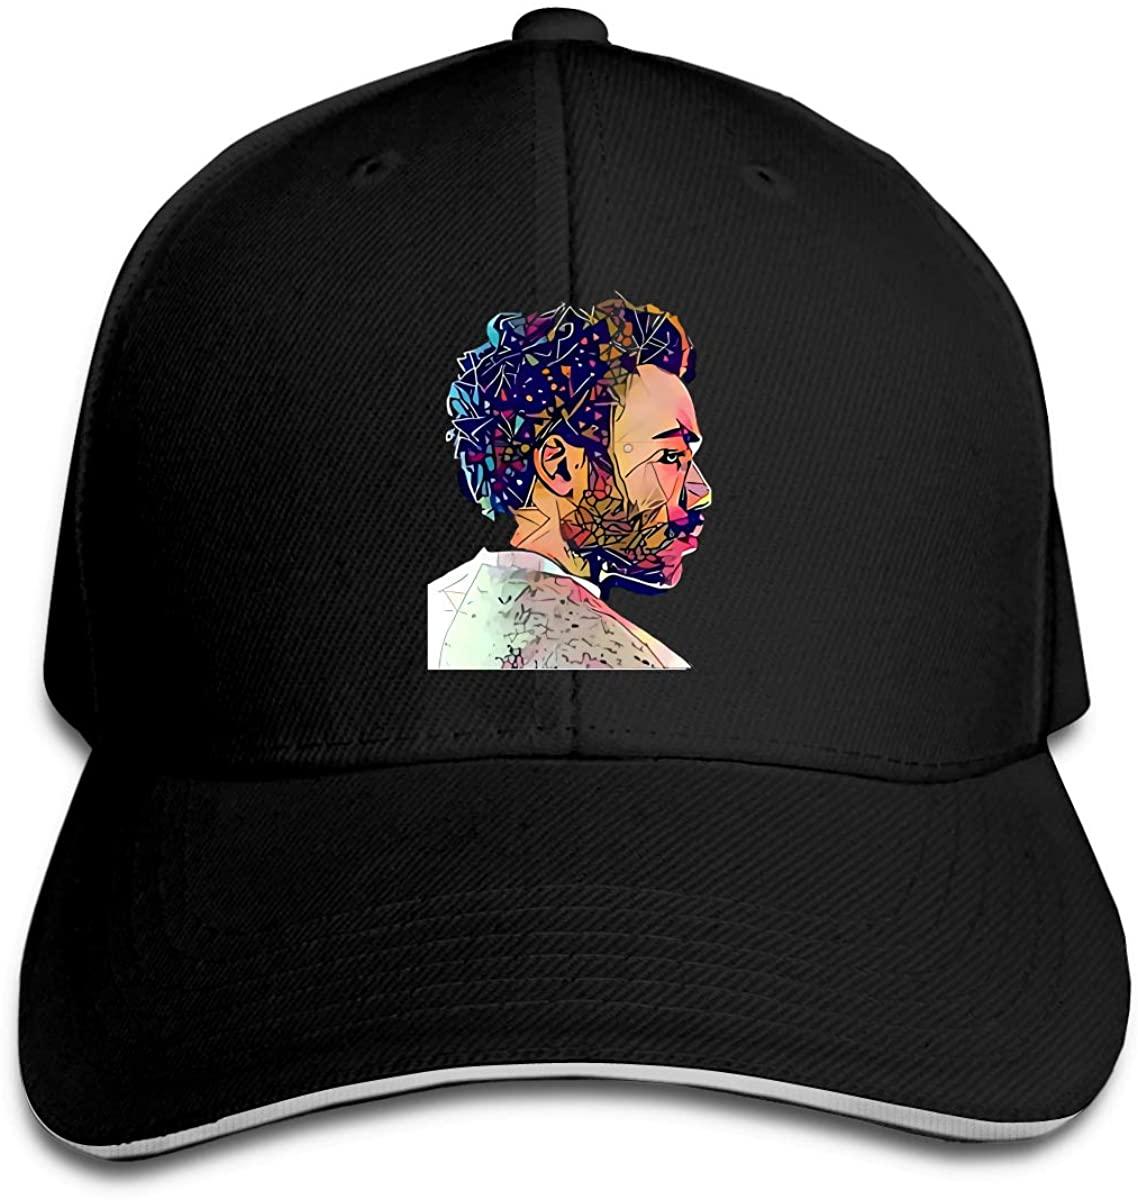 Cool Childish Gambino Hip Hop Baseball Cap Golf Trucker Baseball Cap Adjustable Peaked Sandwich Hat Black Unisex Casquette